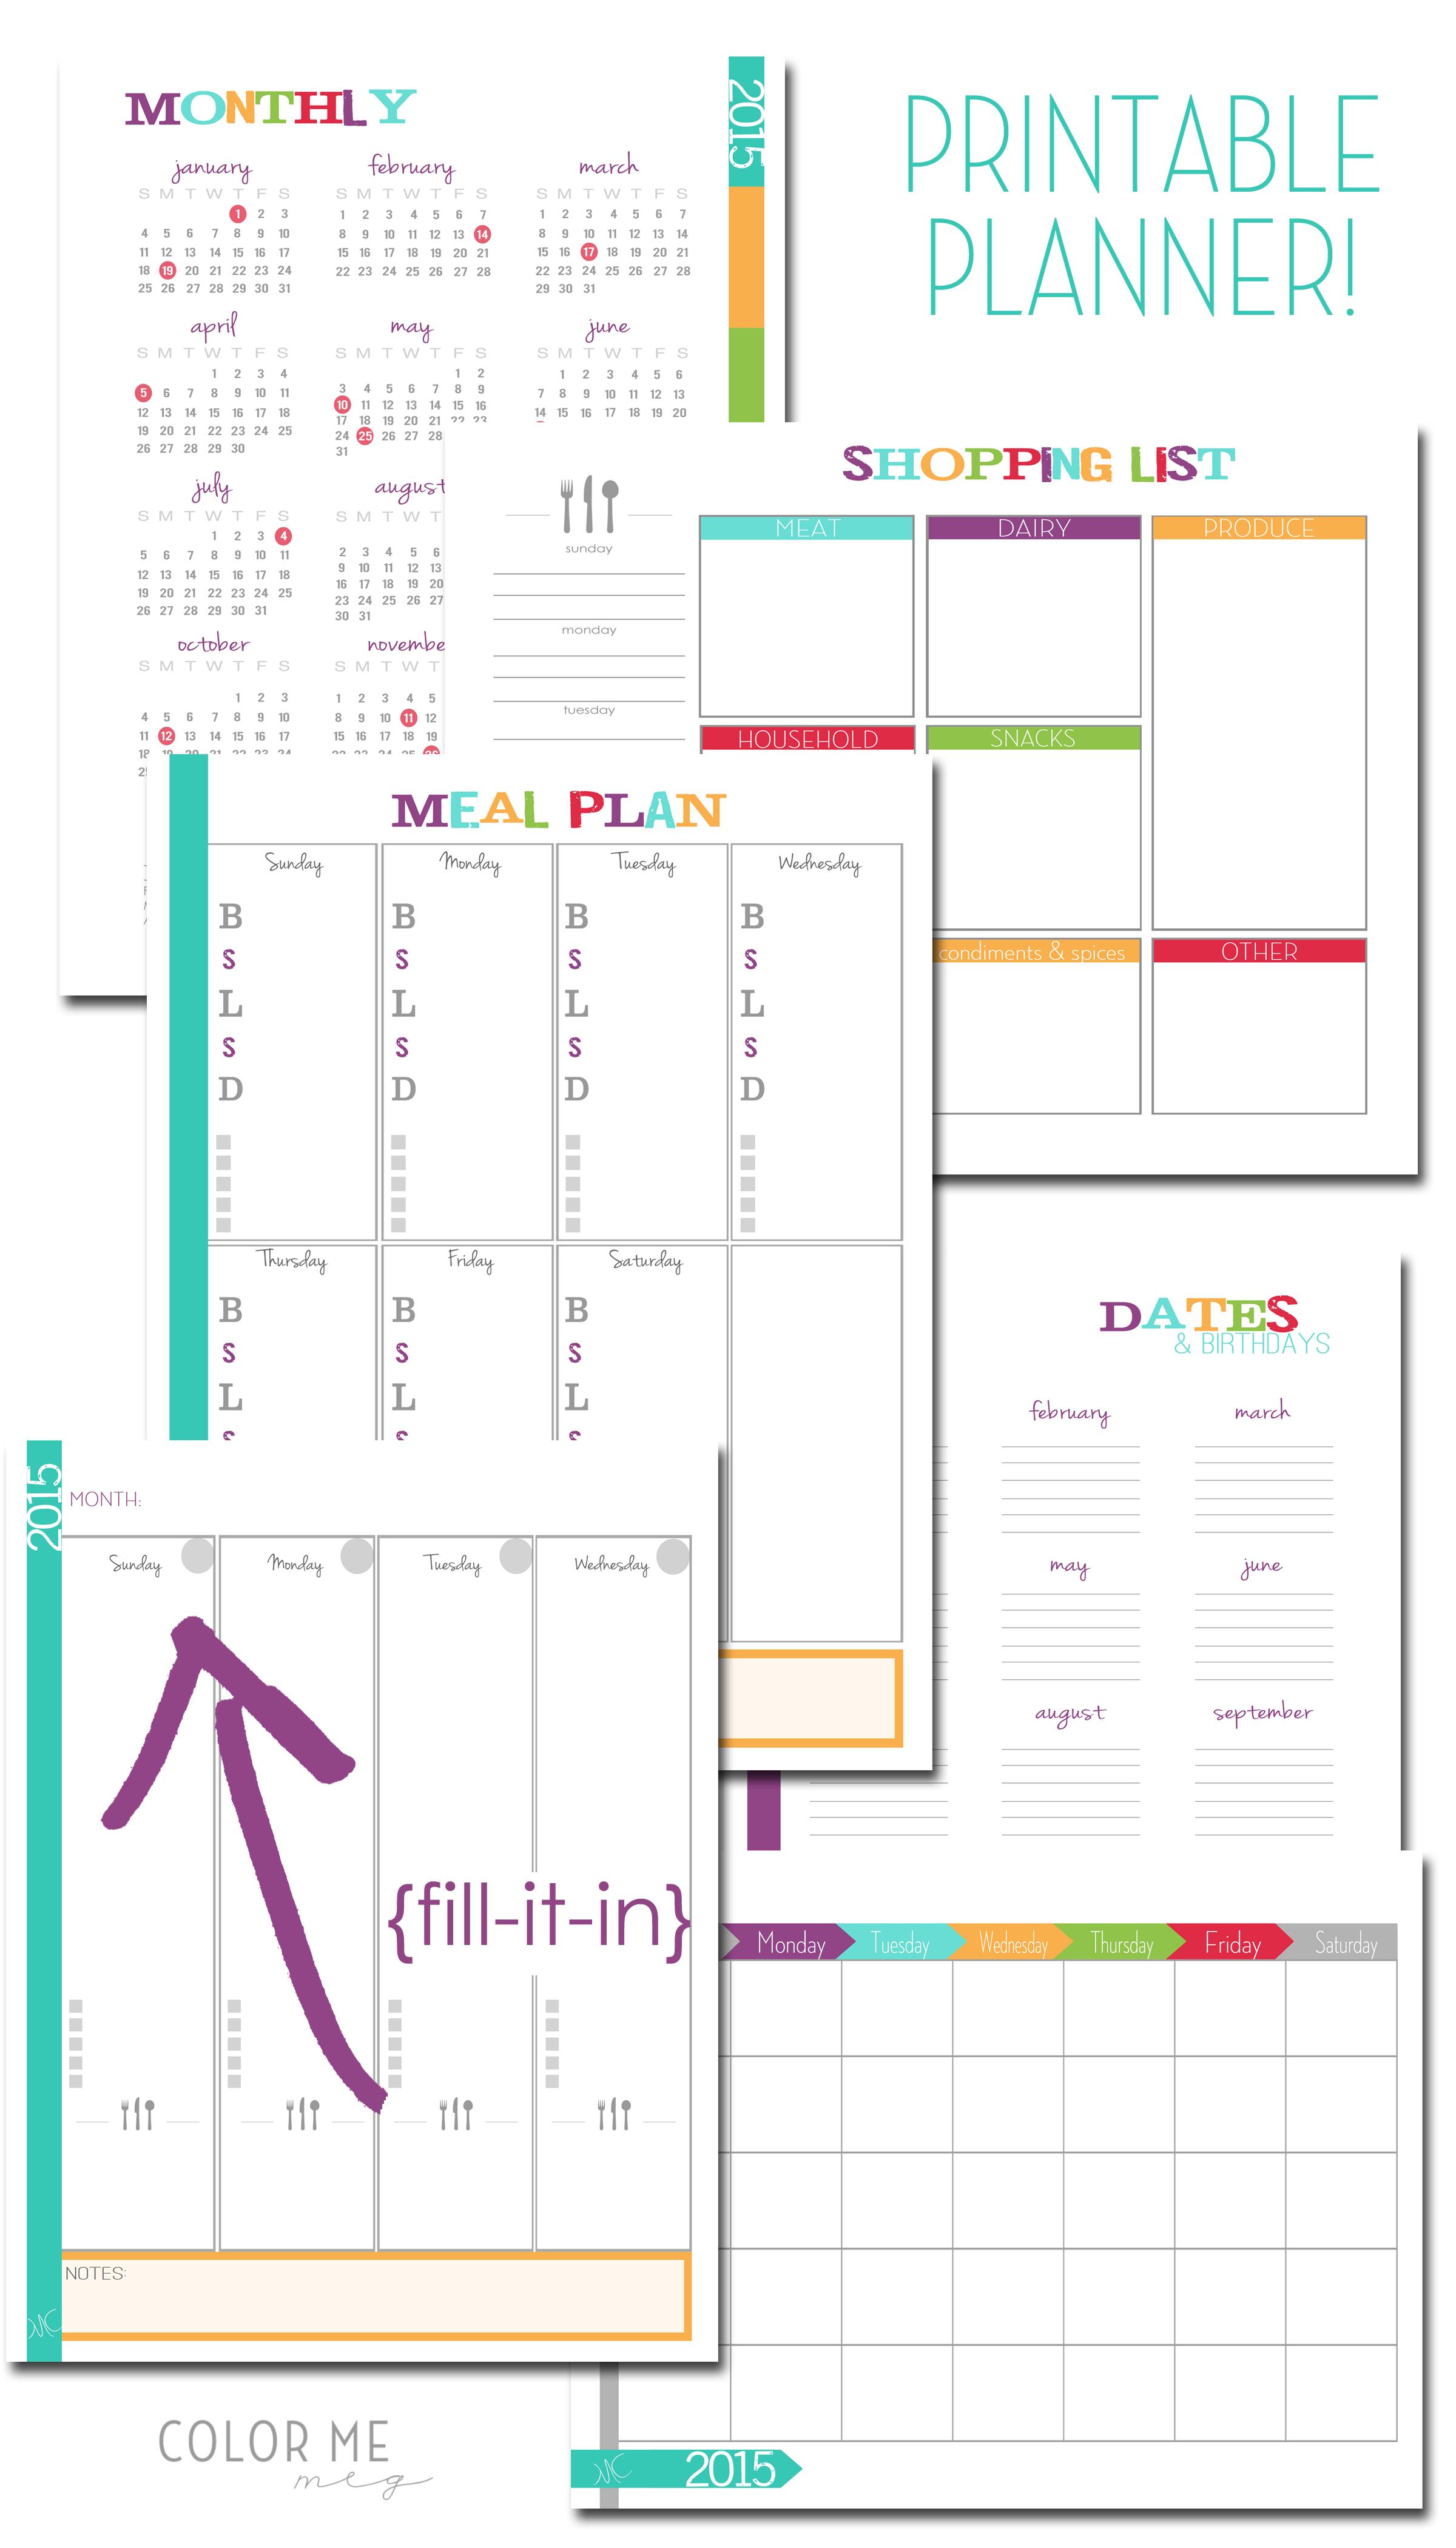 New Printable Planner